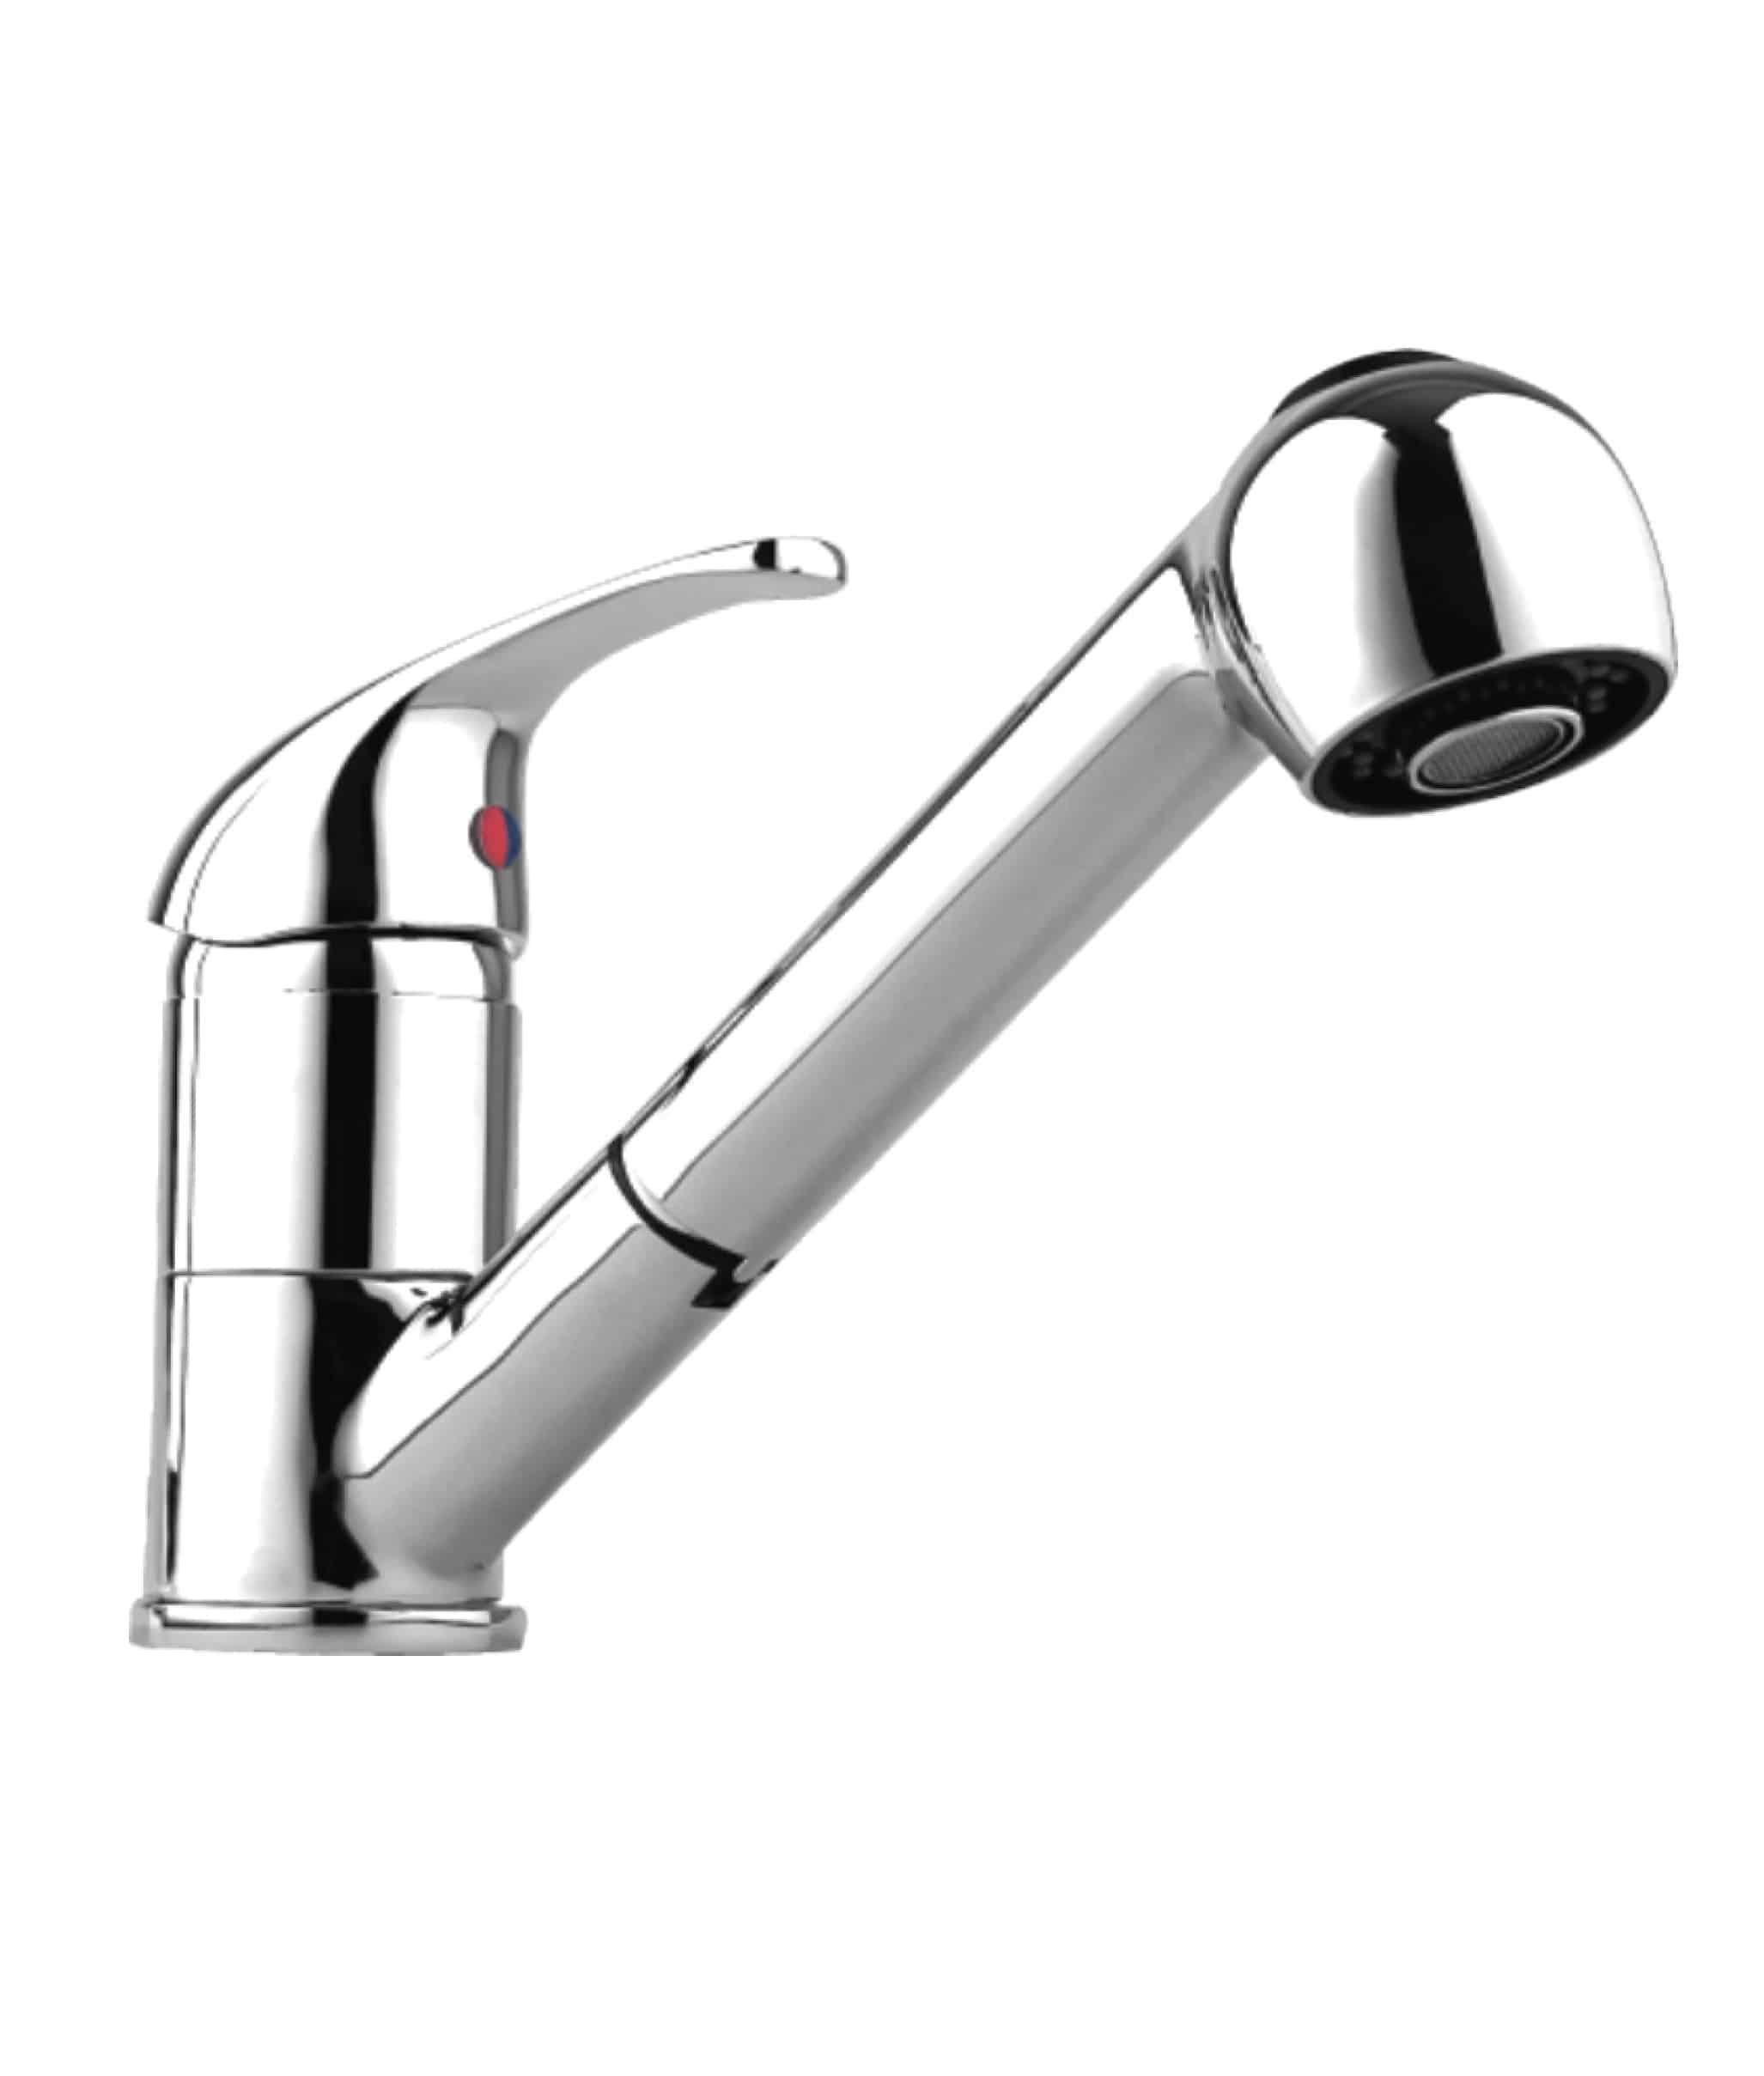 Plus Single Lever Pull Out Spout Sink Mixer | Niko Bathrooms